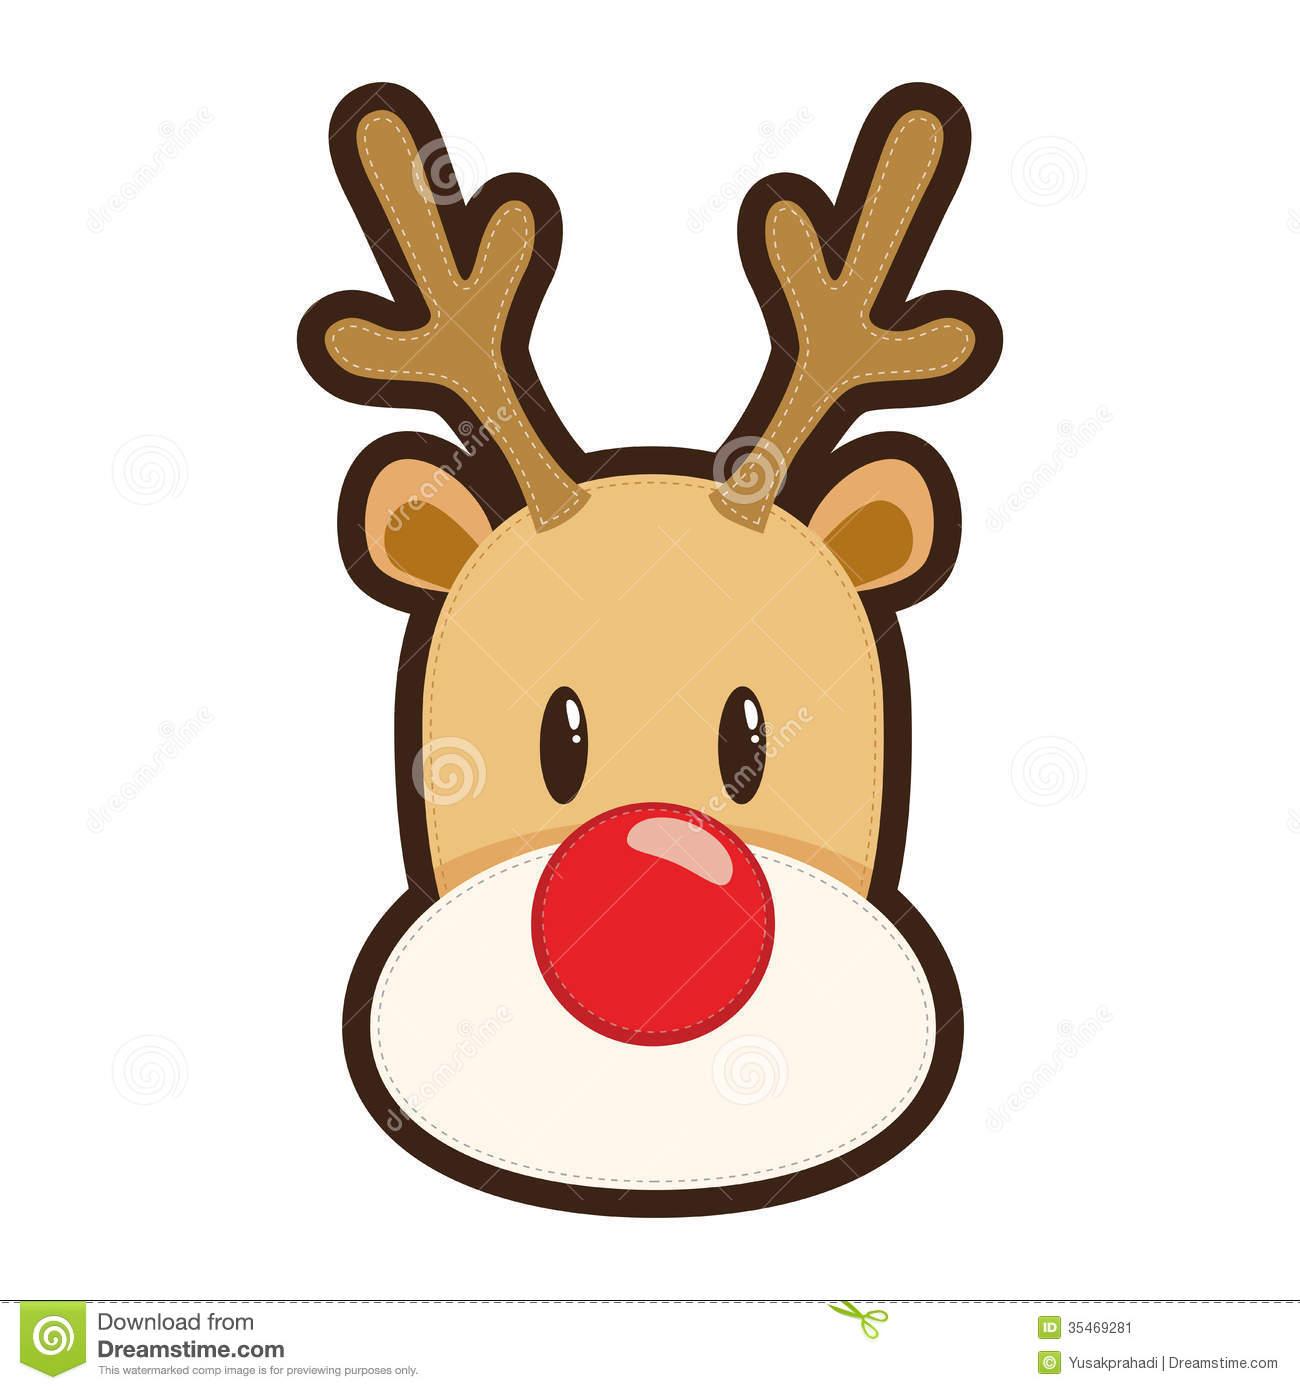 Rudolph Reindeer Clipart - Clipart Kid